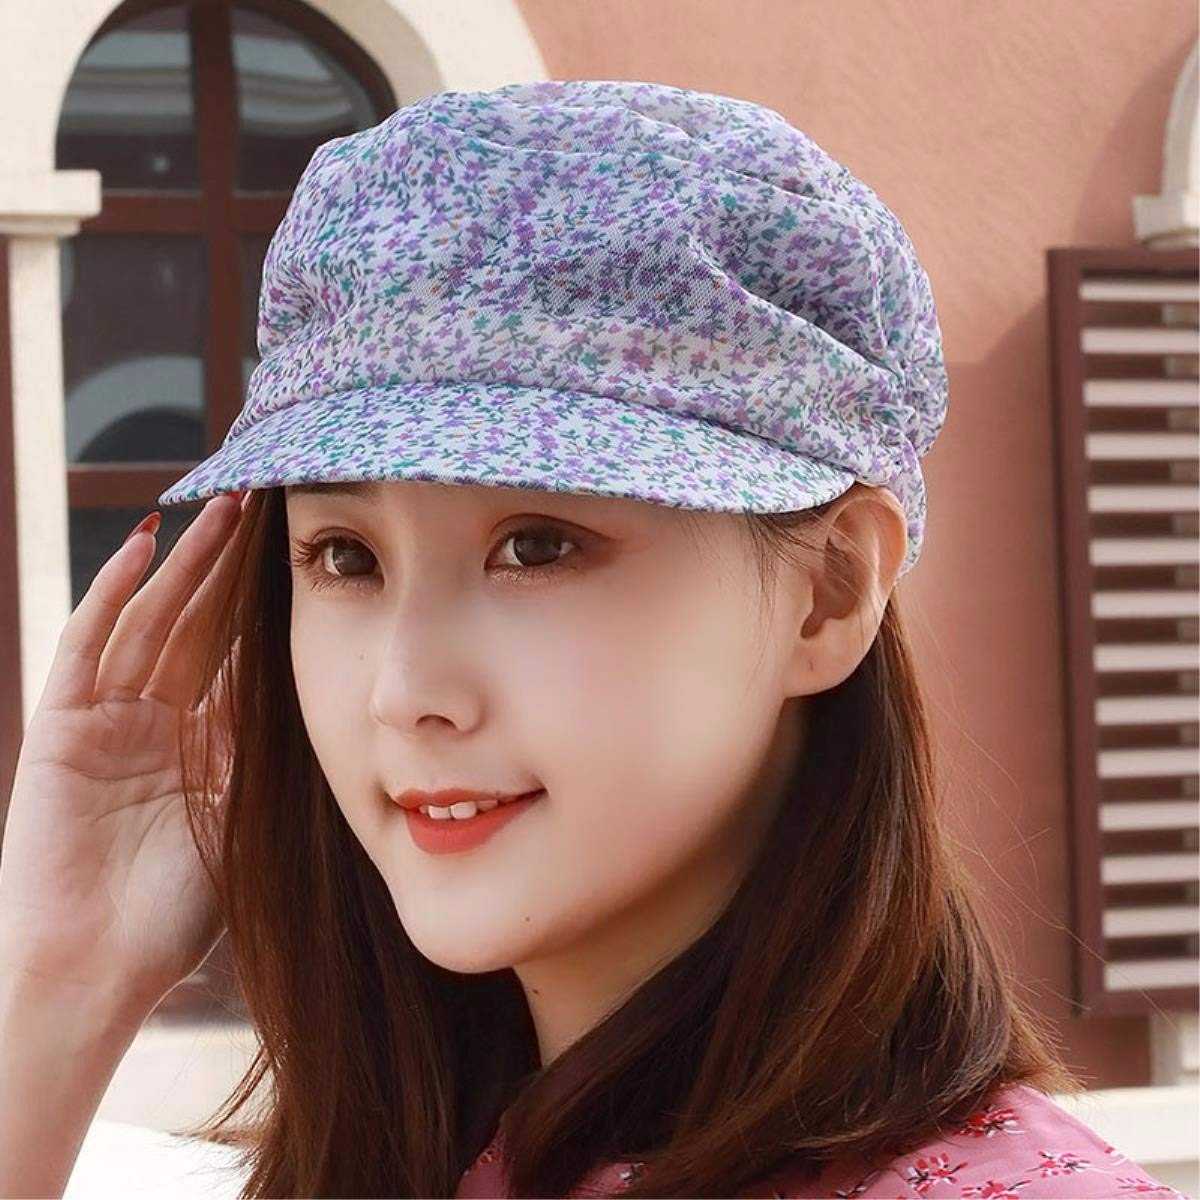 D BRNEBN Female spring and summer cap flat top hat stylish visor outdoor alpine hat CLOTH HAT